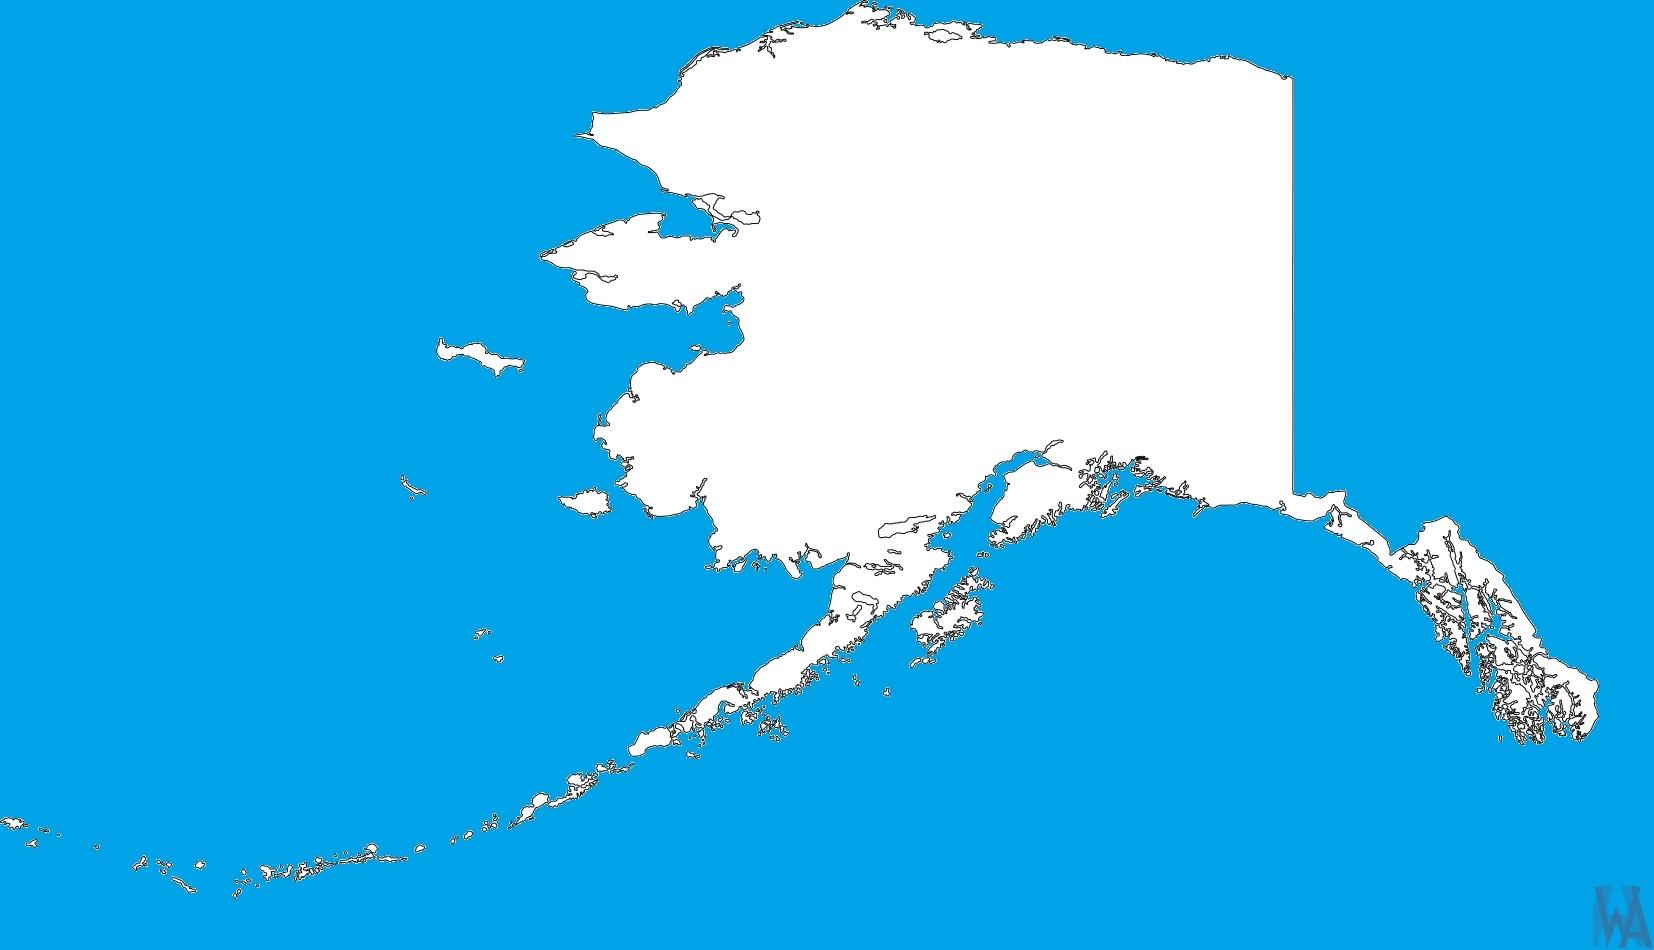 Alaska Blank Outline Map  | Blank Outline Map of Alaska